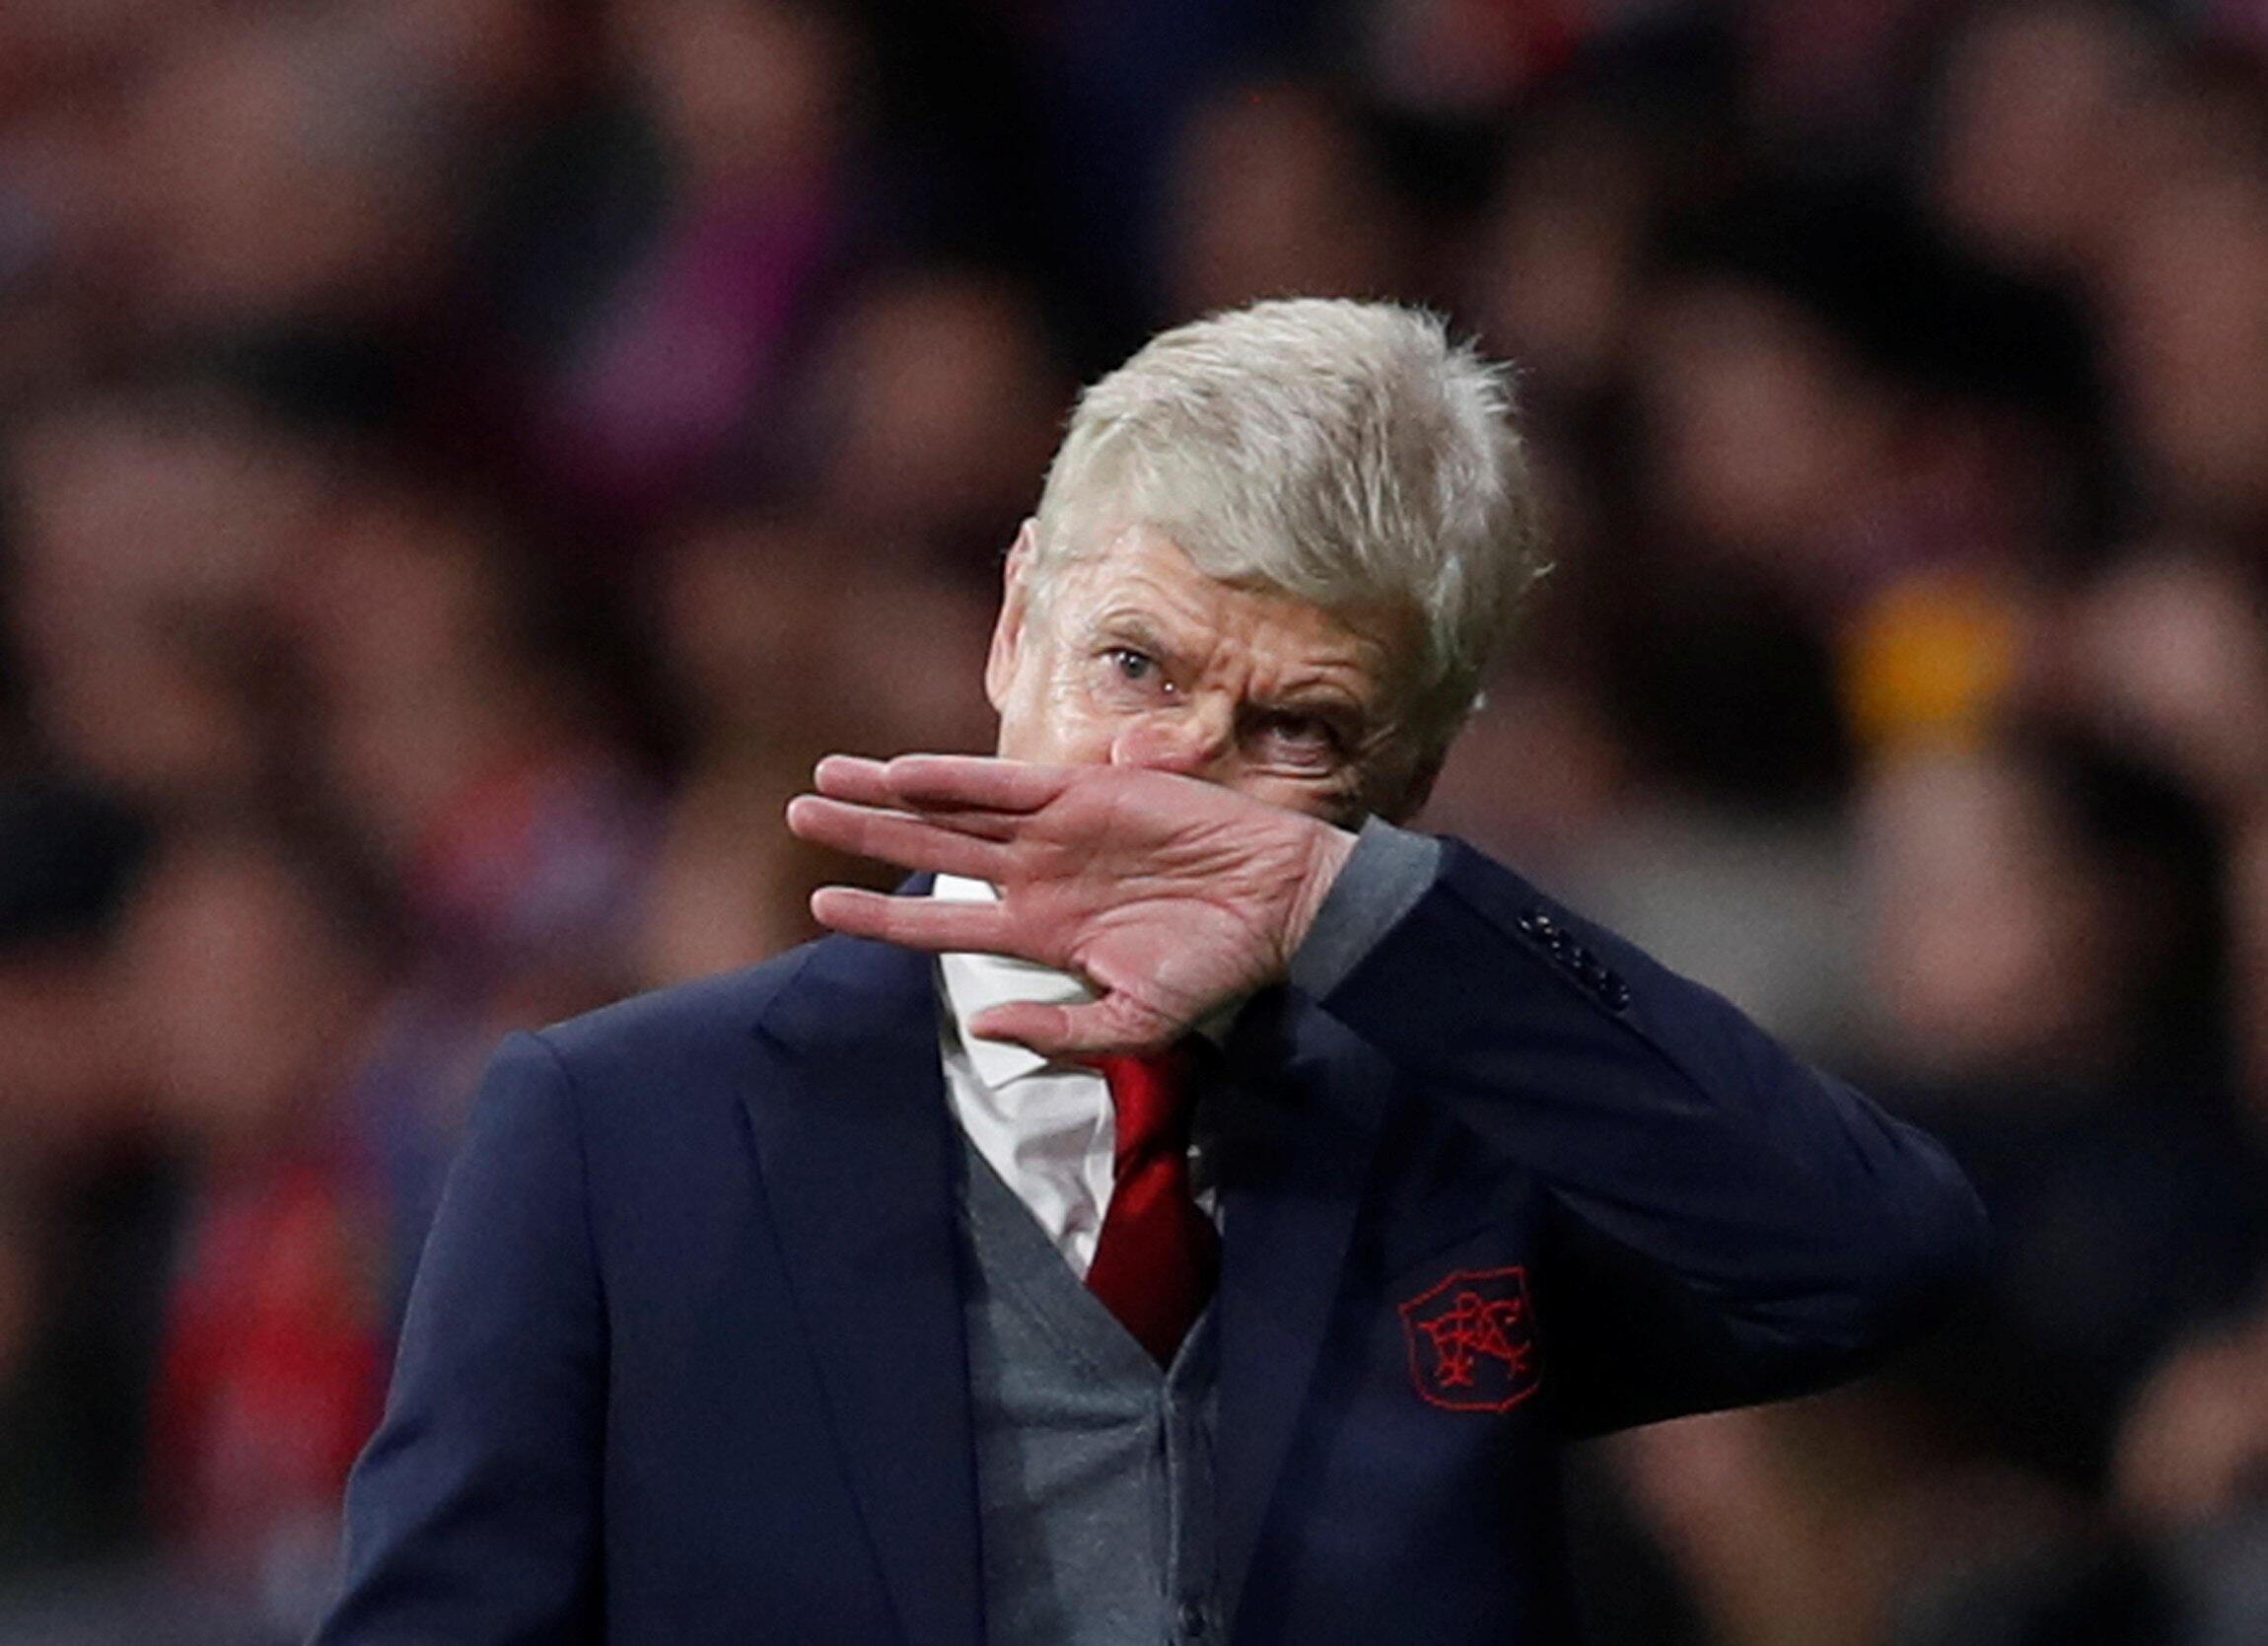 Kocha wa zamani wa Arsenal, Arsene Wenger.